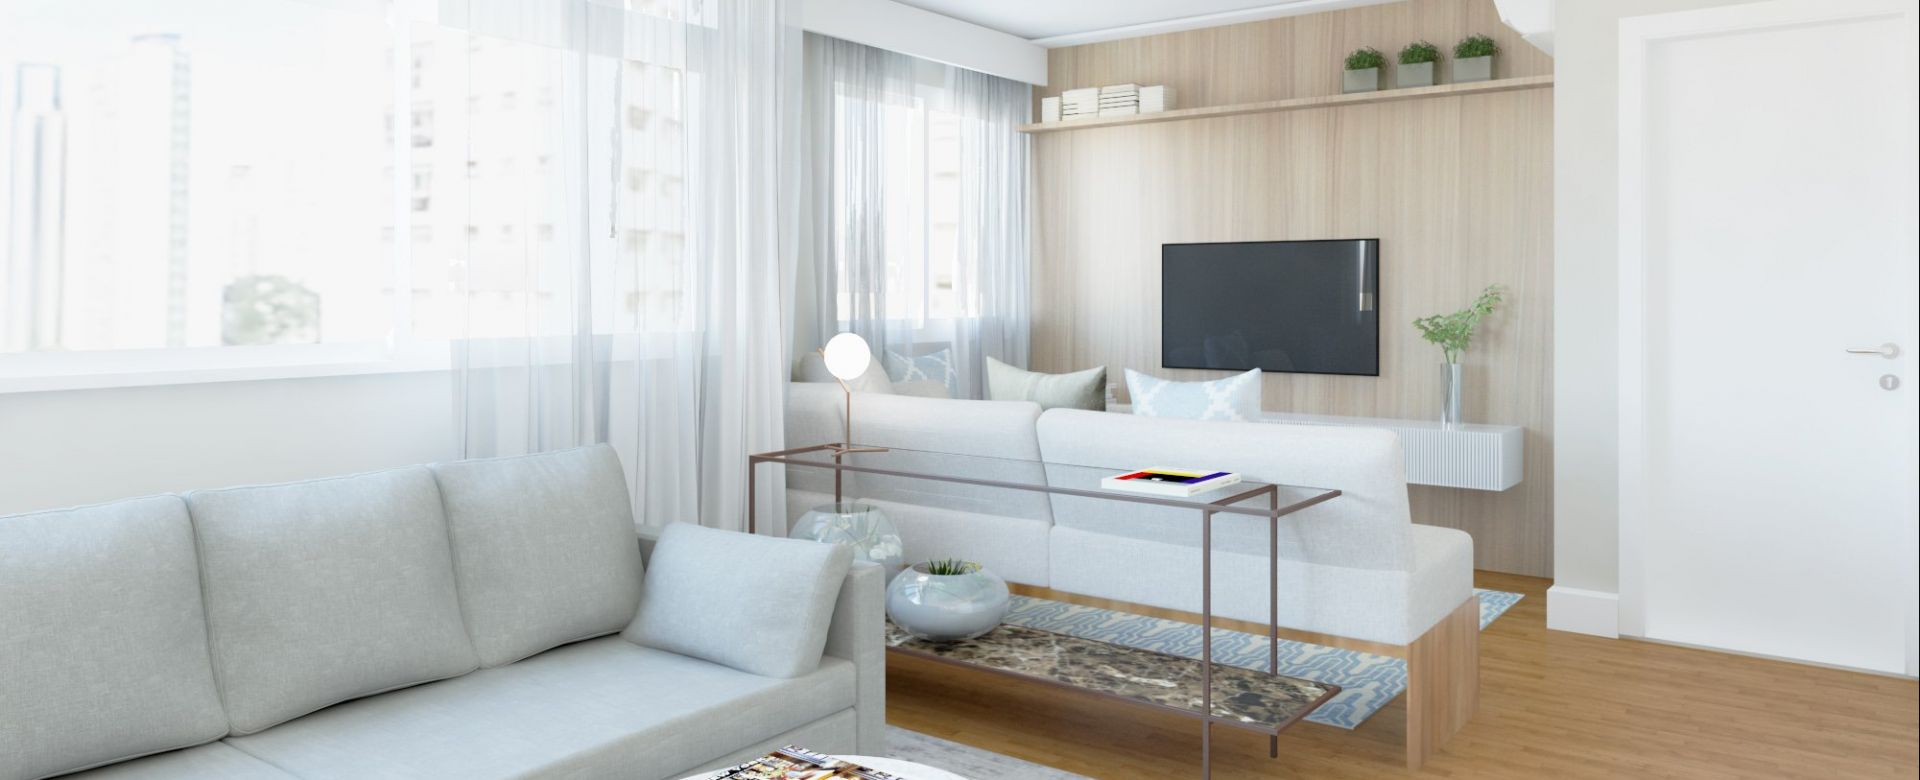 Imagem destaque do Edifício Franchesco Taralo